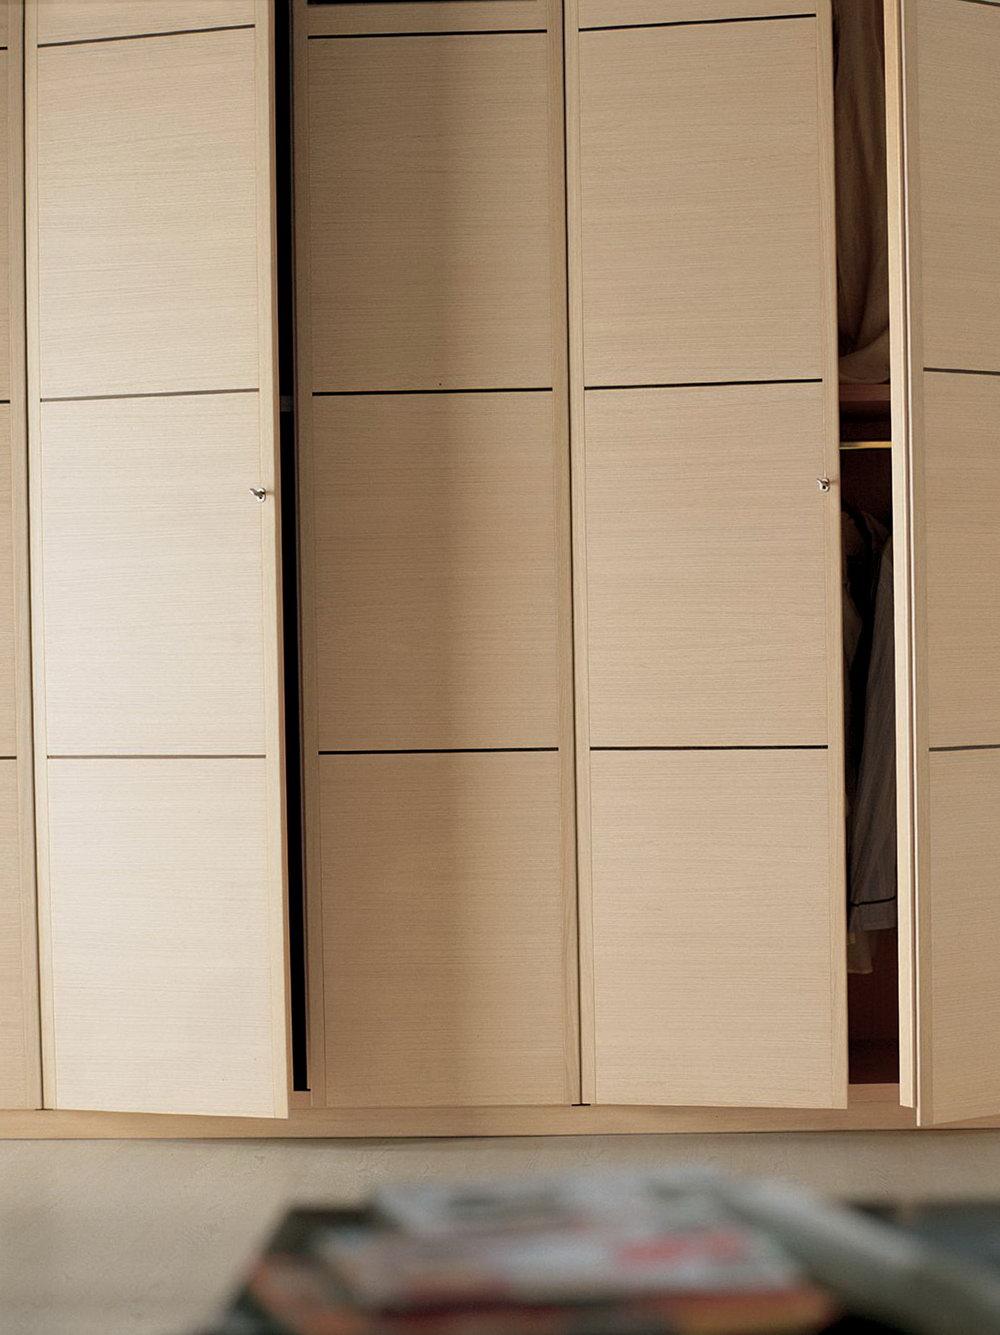 Where To Buy A Closet Door